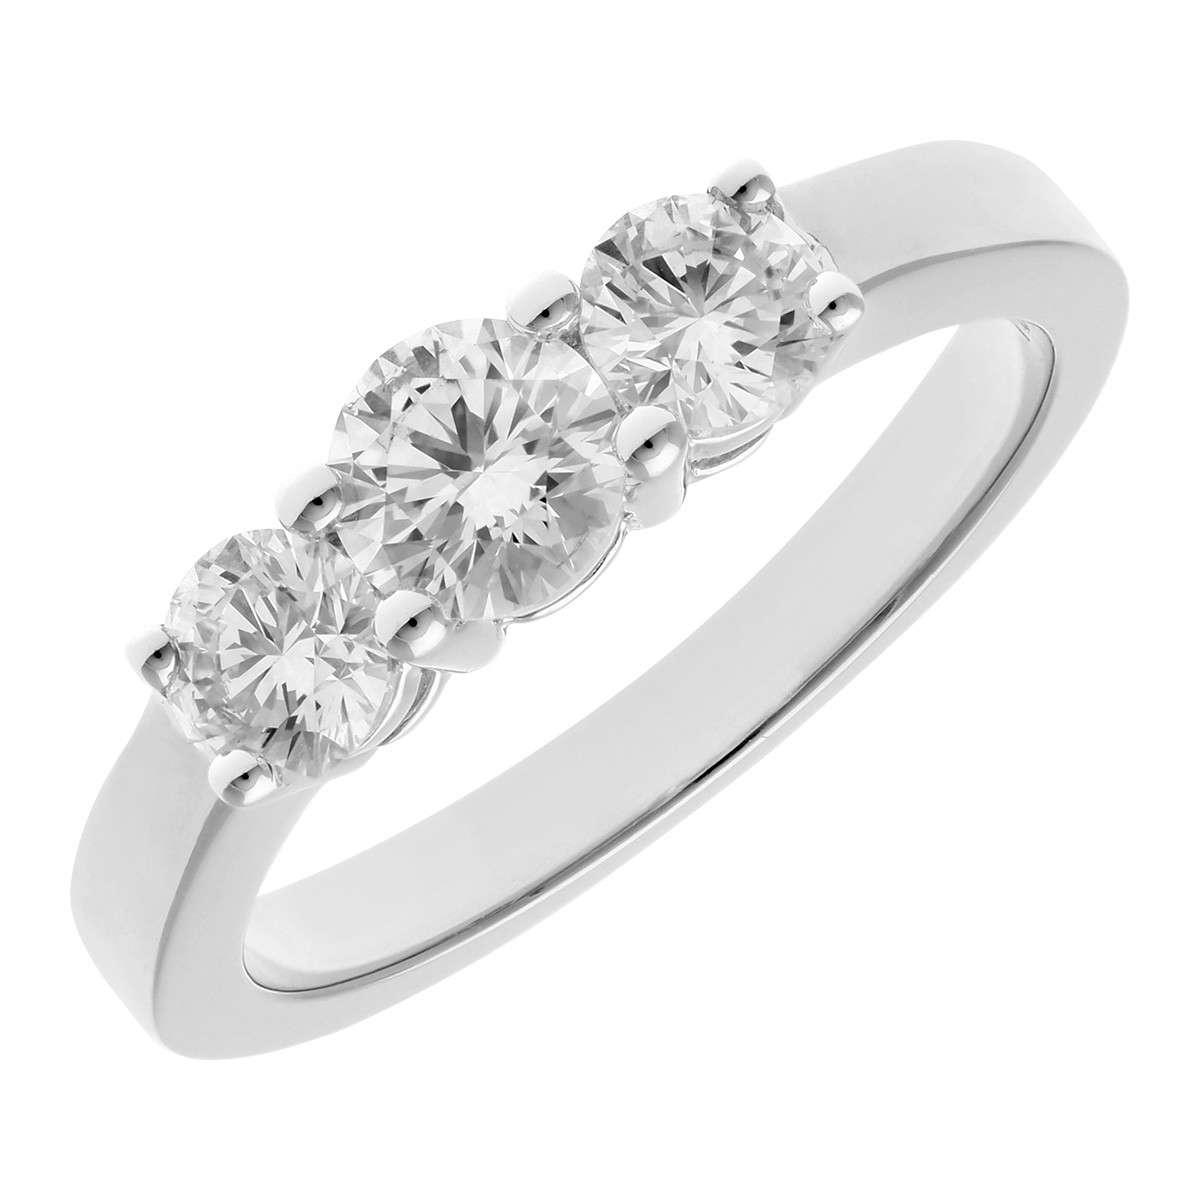 18CT WHITE GOLD 1.00CT DIAMOND 3 STONE RING